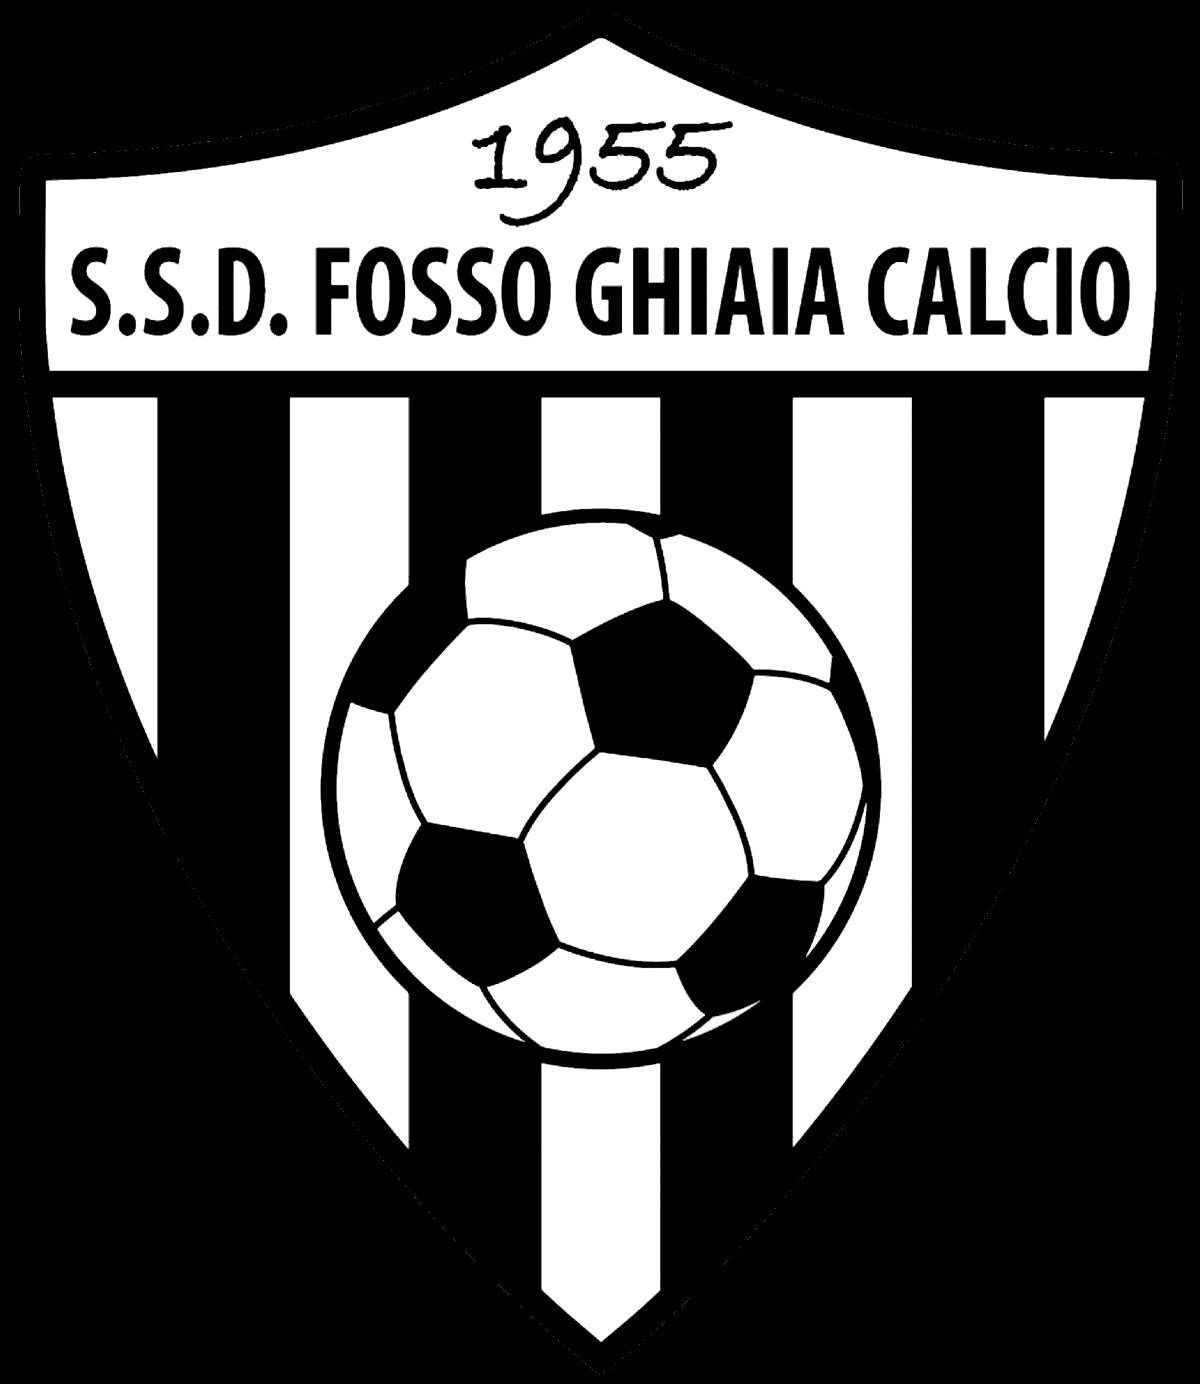 https://www.tuttocampo.it/Web/Images/Teams/Original/19500.png?v=1535043770